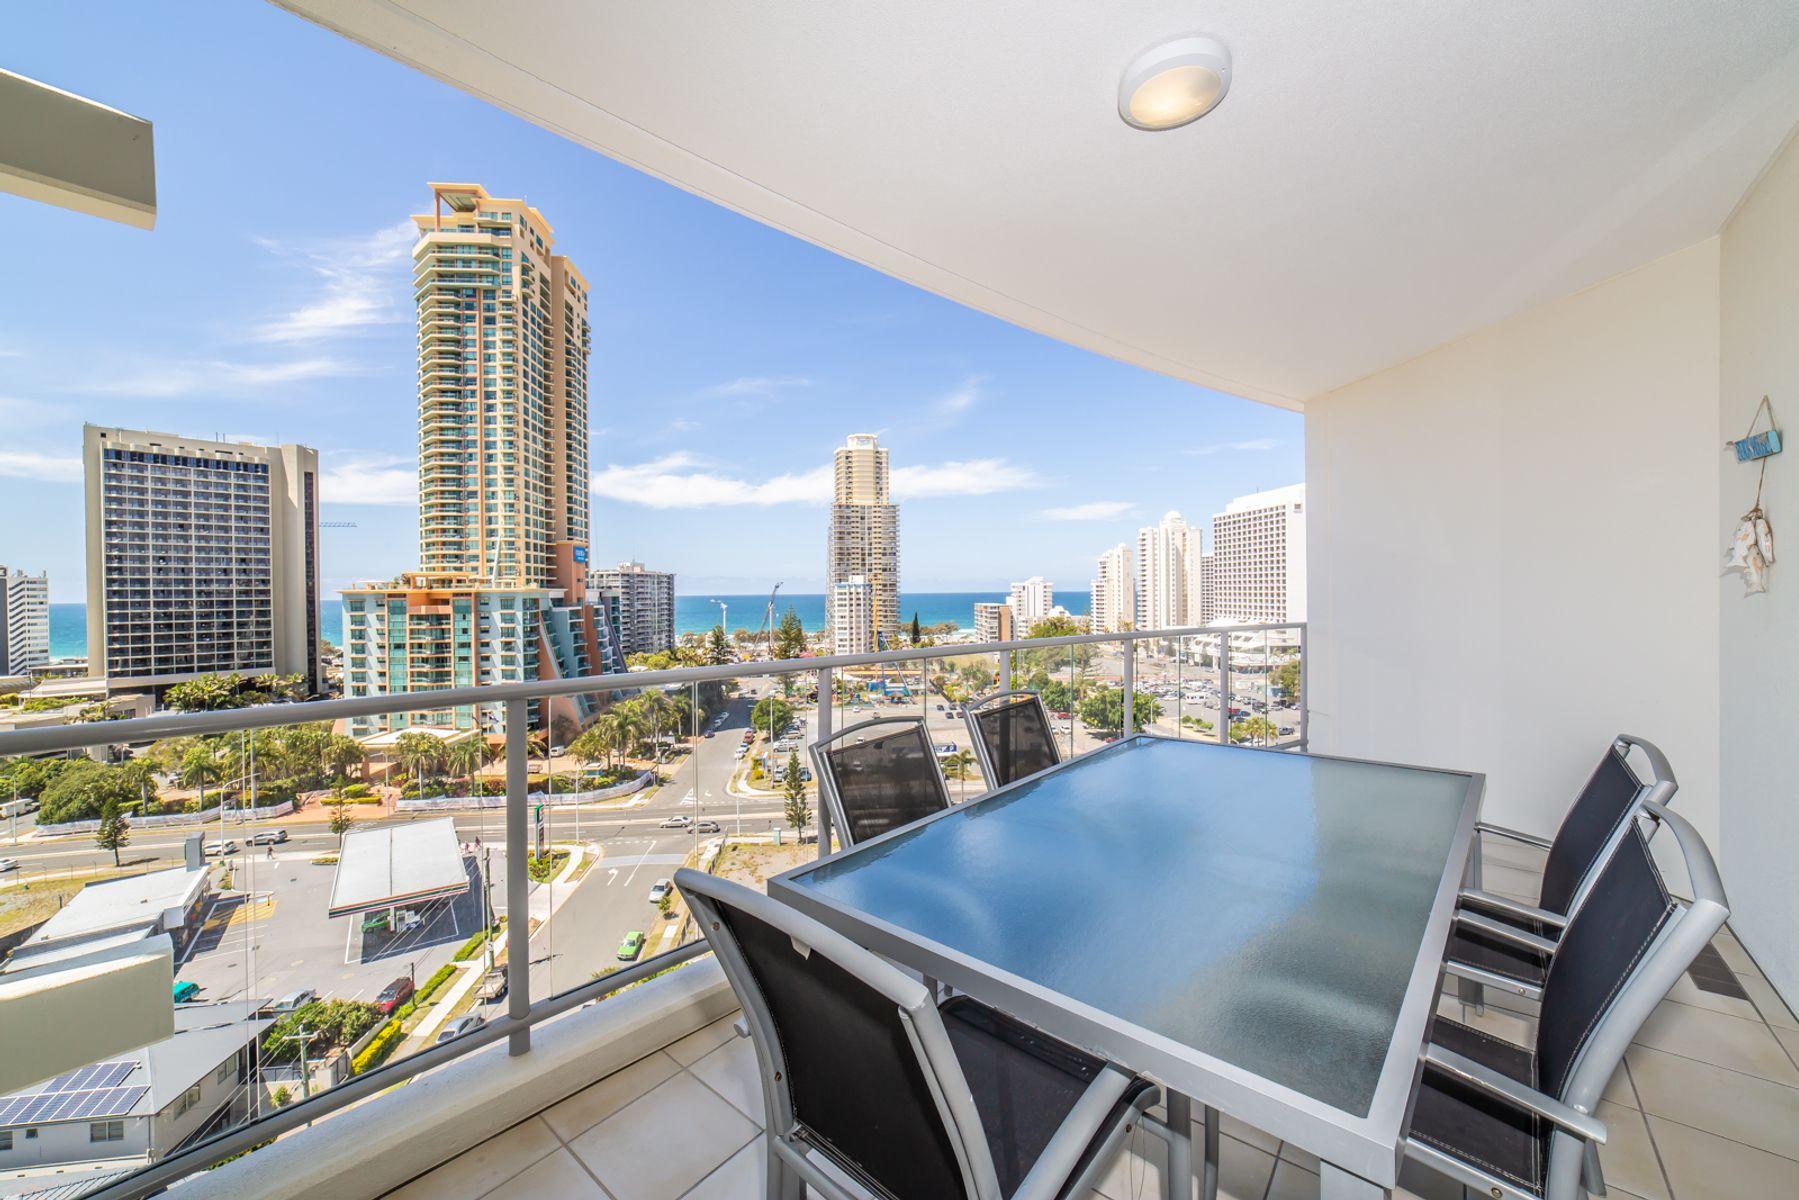 3143/21-31 @ Cypress Avenue, Surfers Paradise, QLD 4217